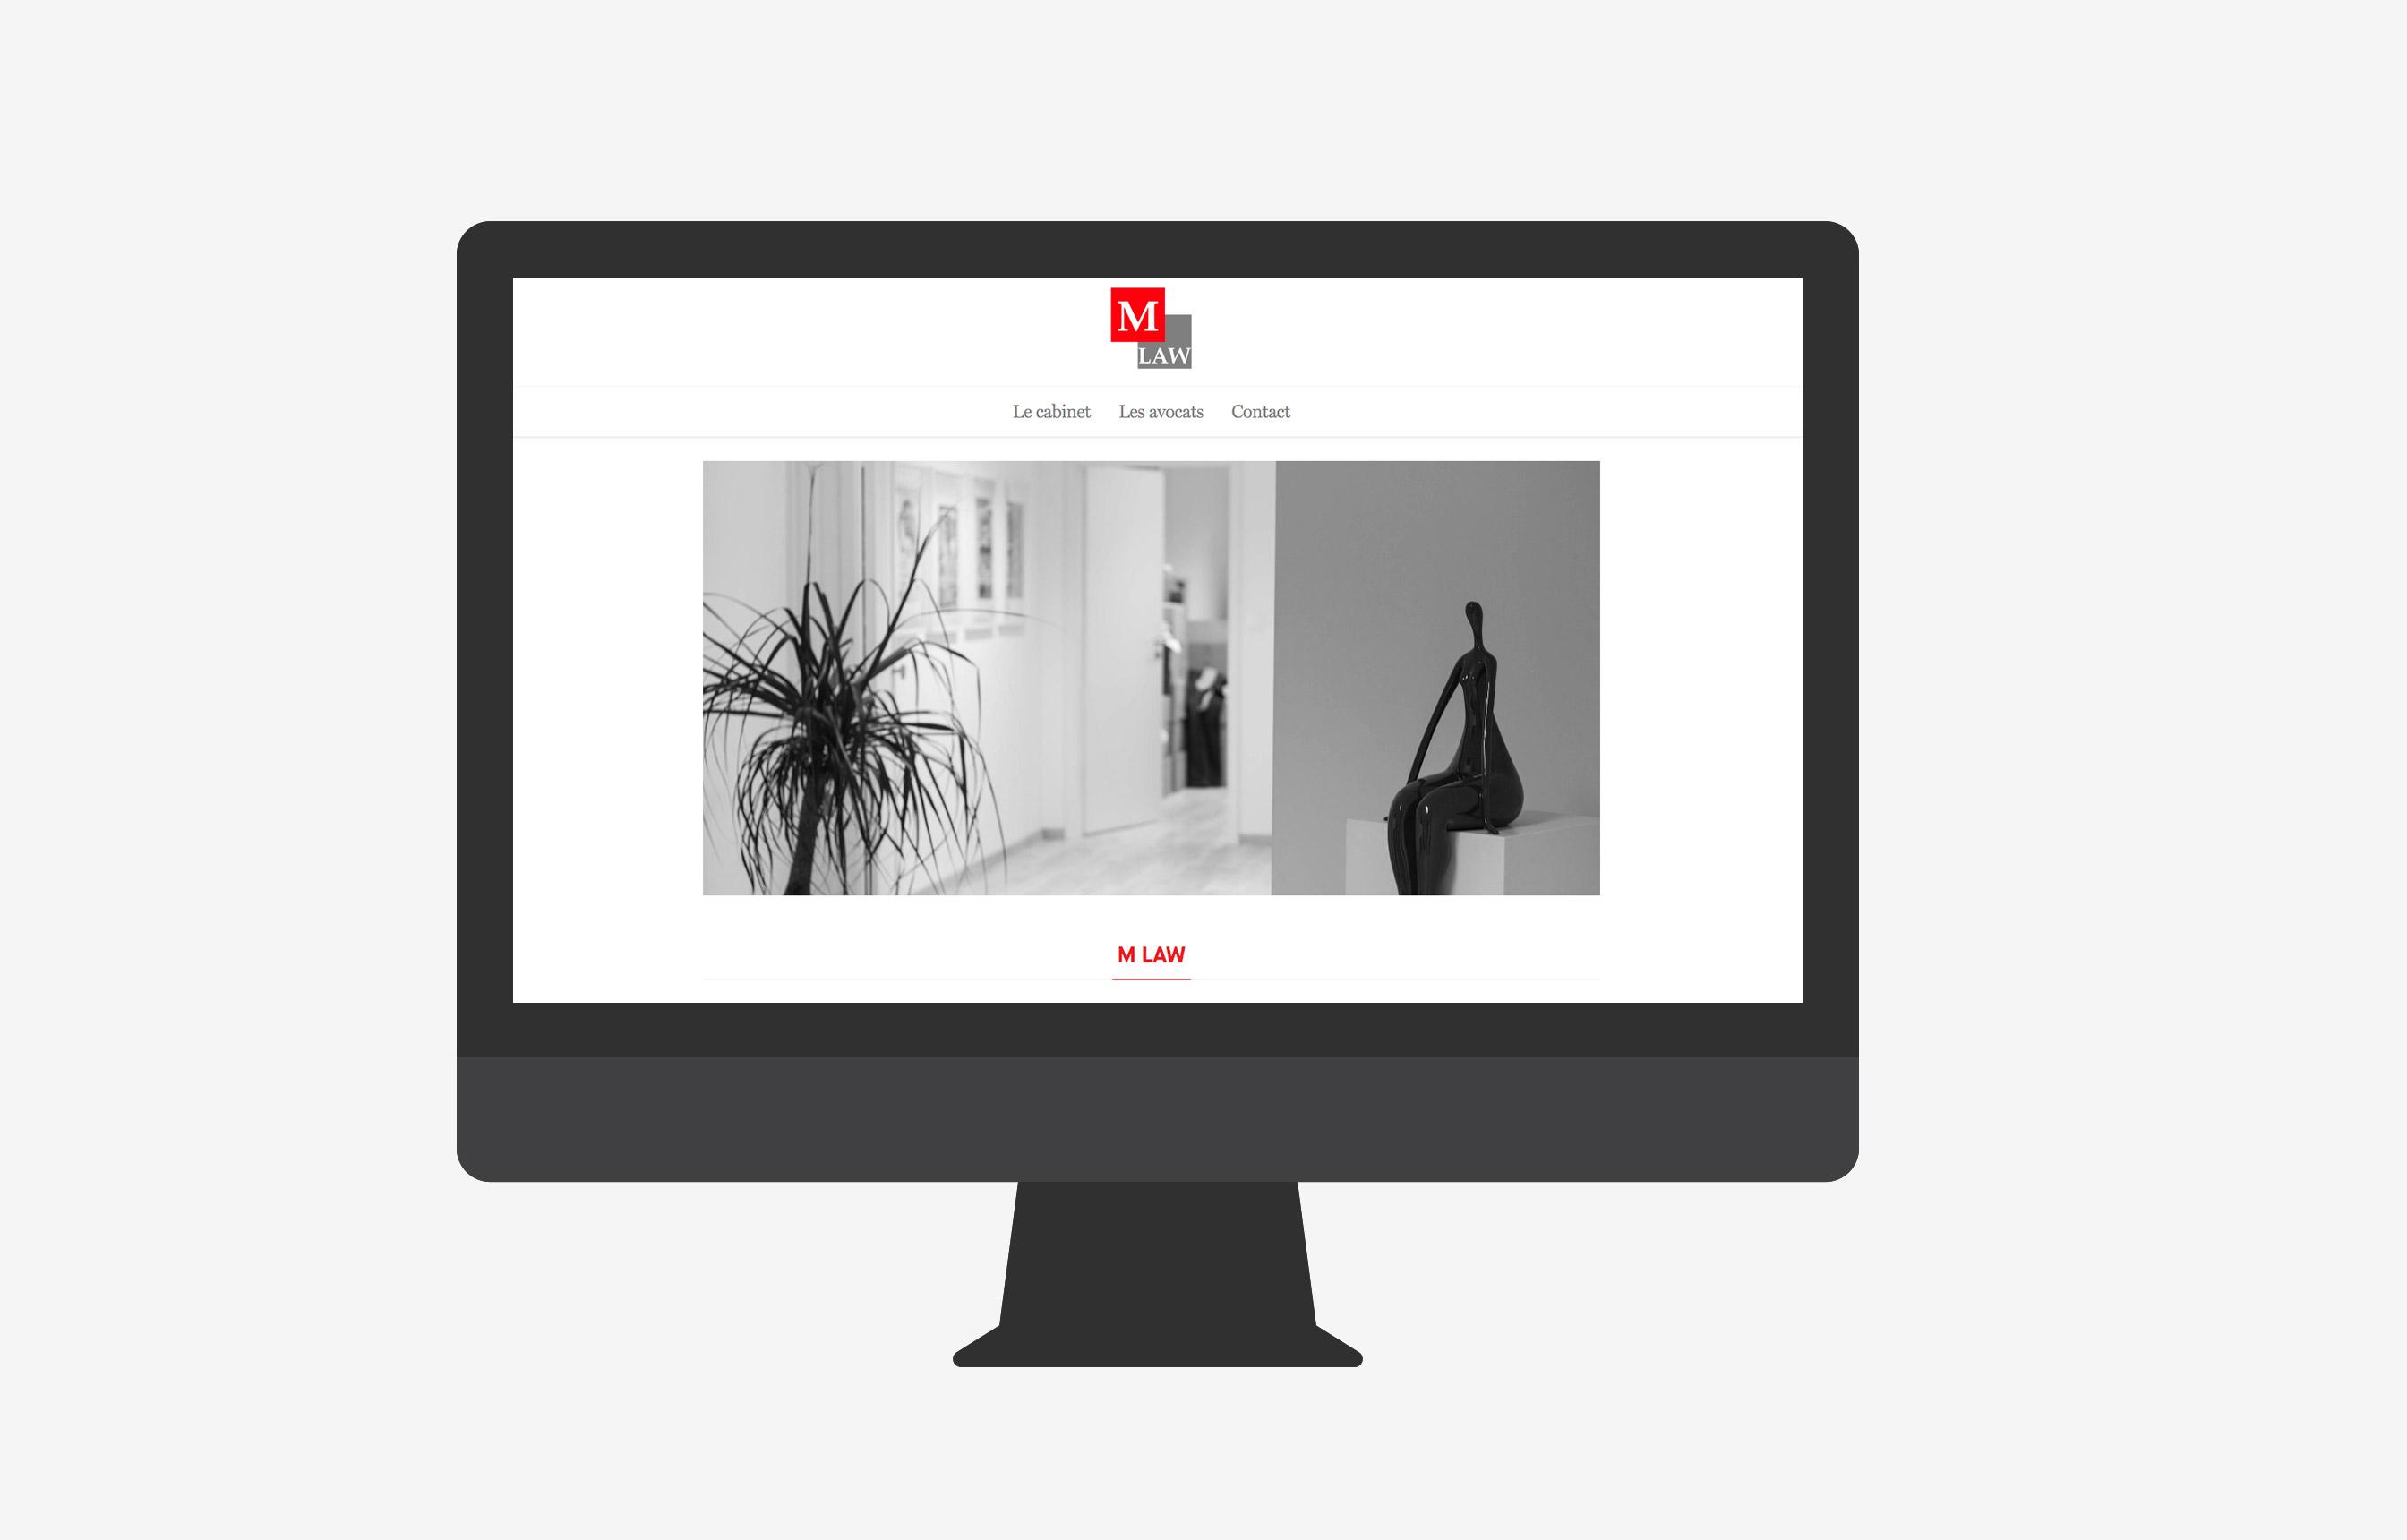 01-mlaw-pikteo-webdesign-graphic-design-freelance-paris-bruxelles-londres